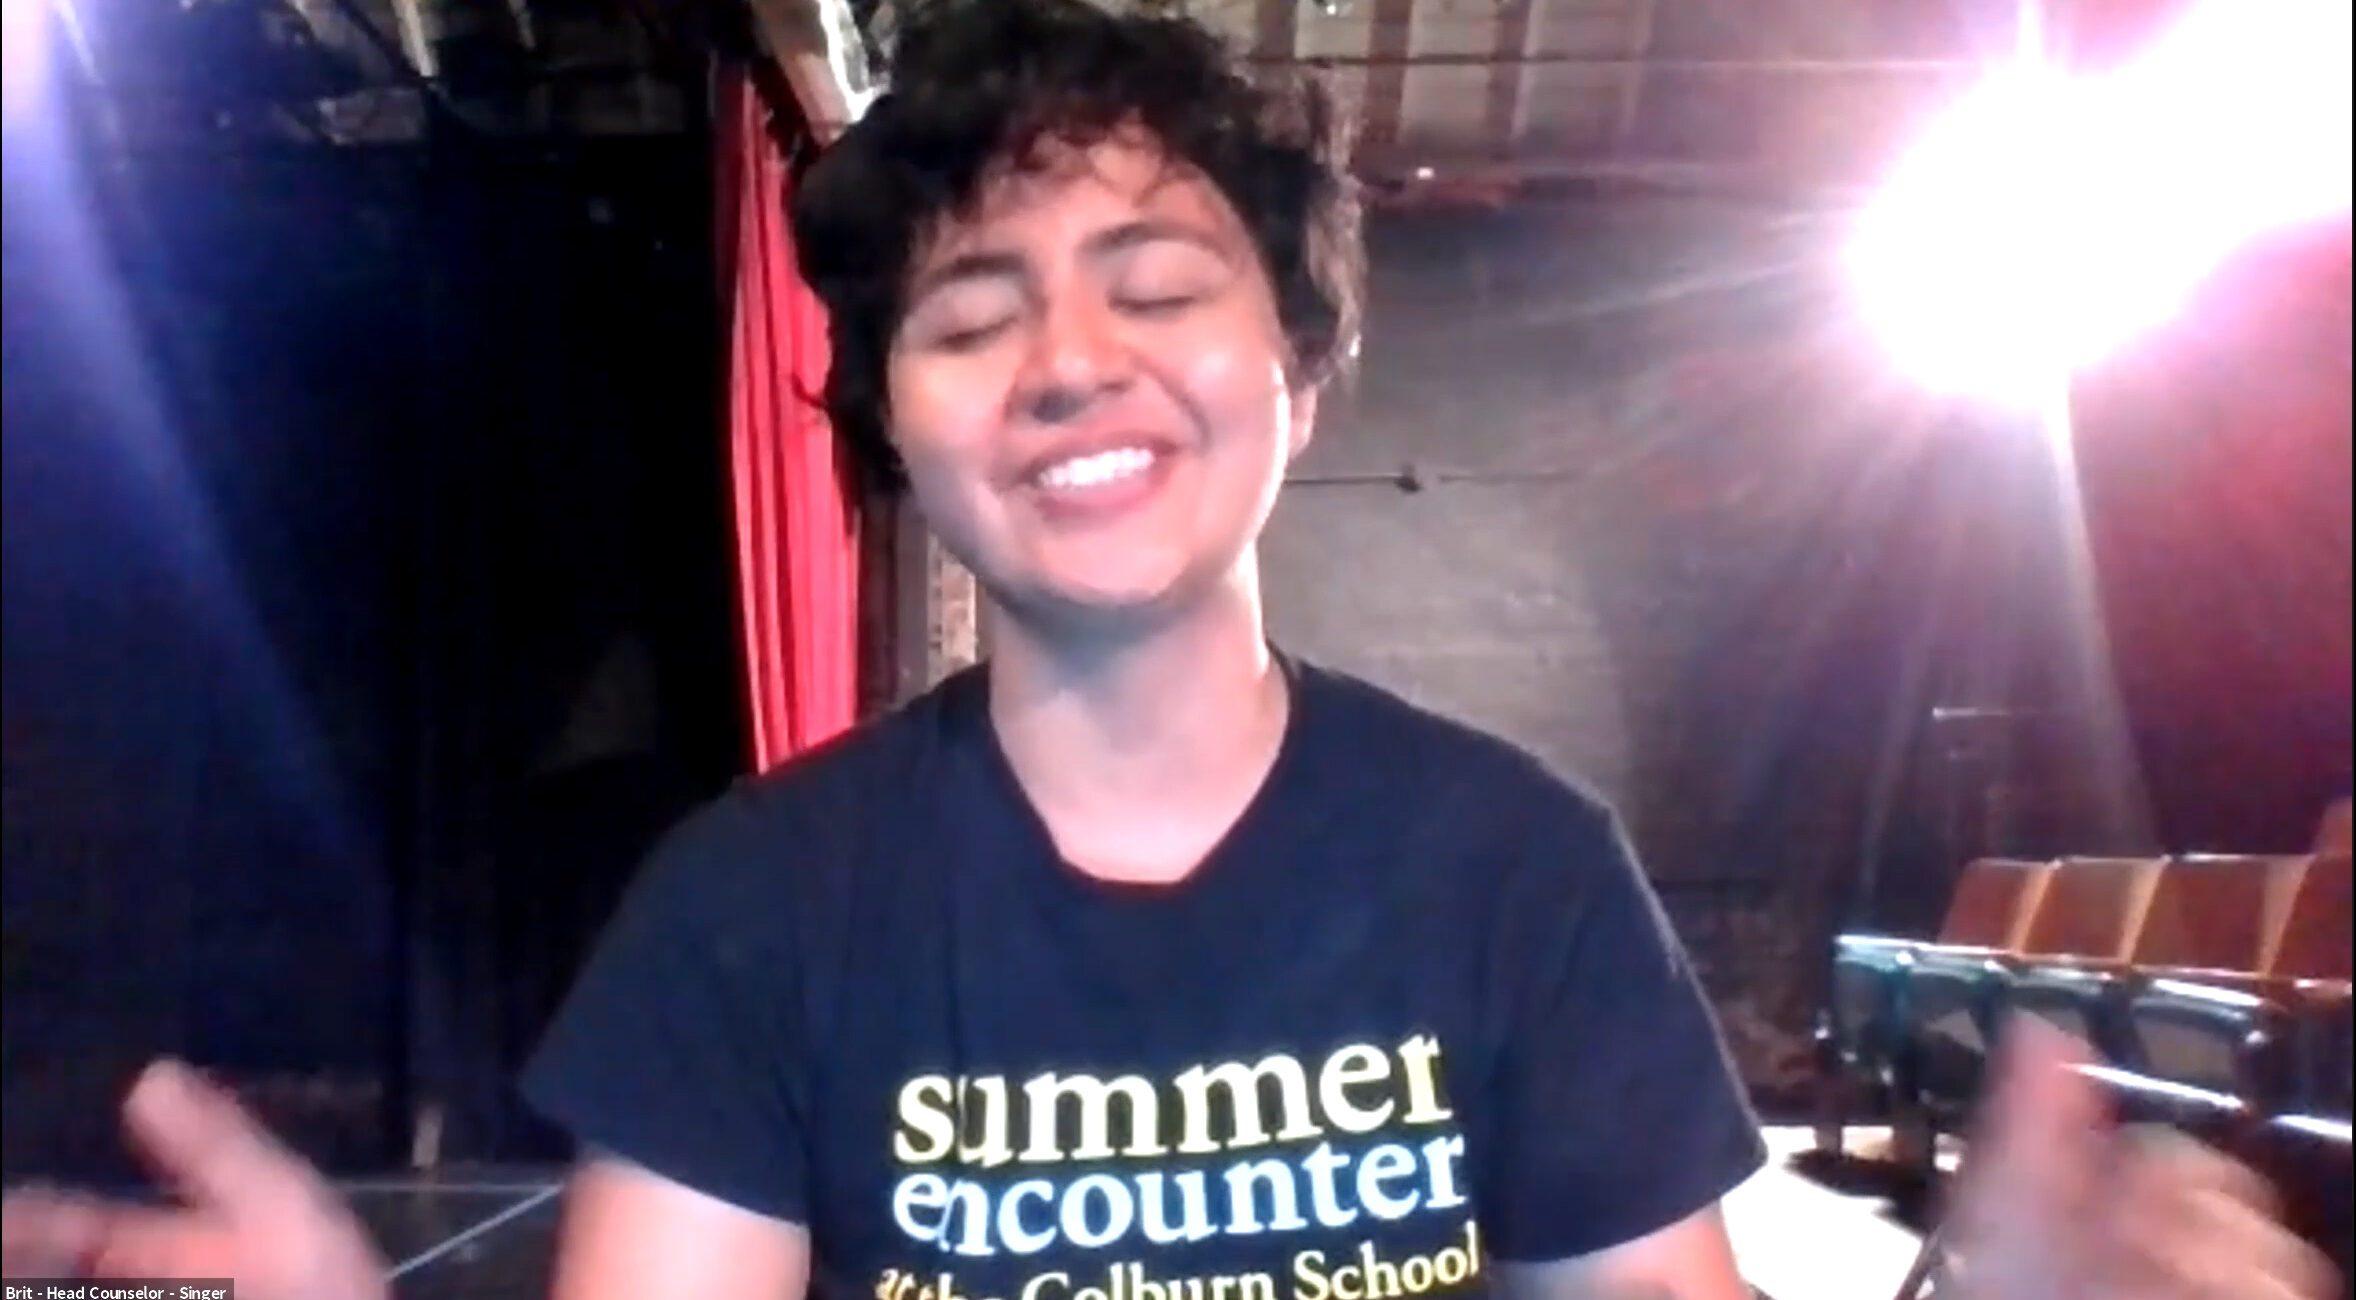 Zoom screenshot of person wearing black Summer Encounter tshirt singing